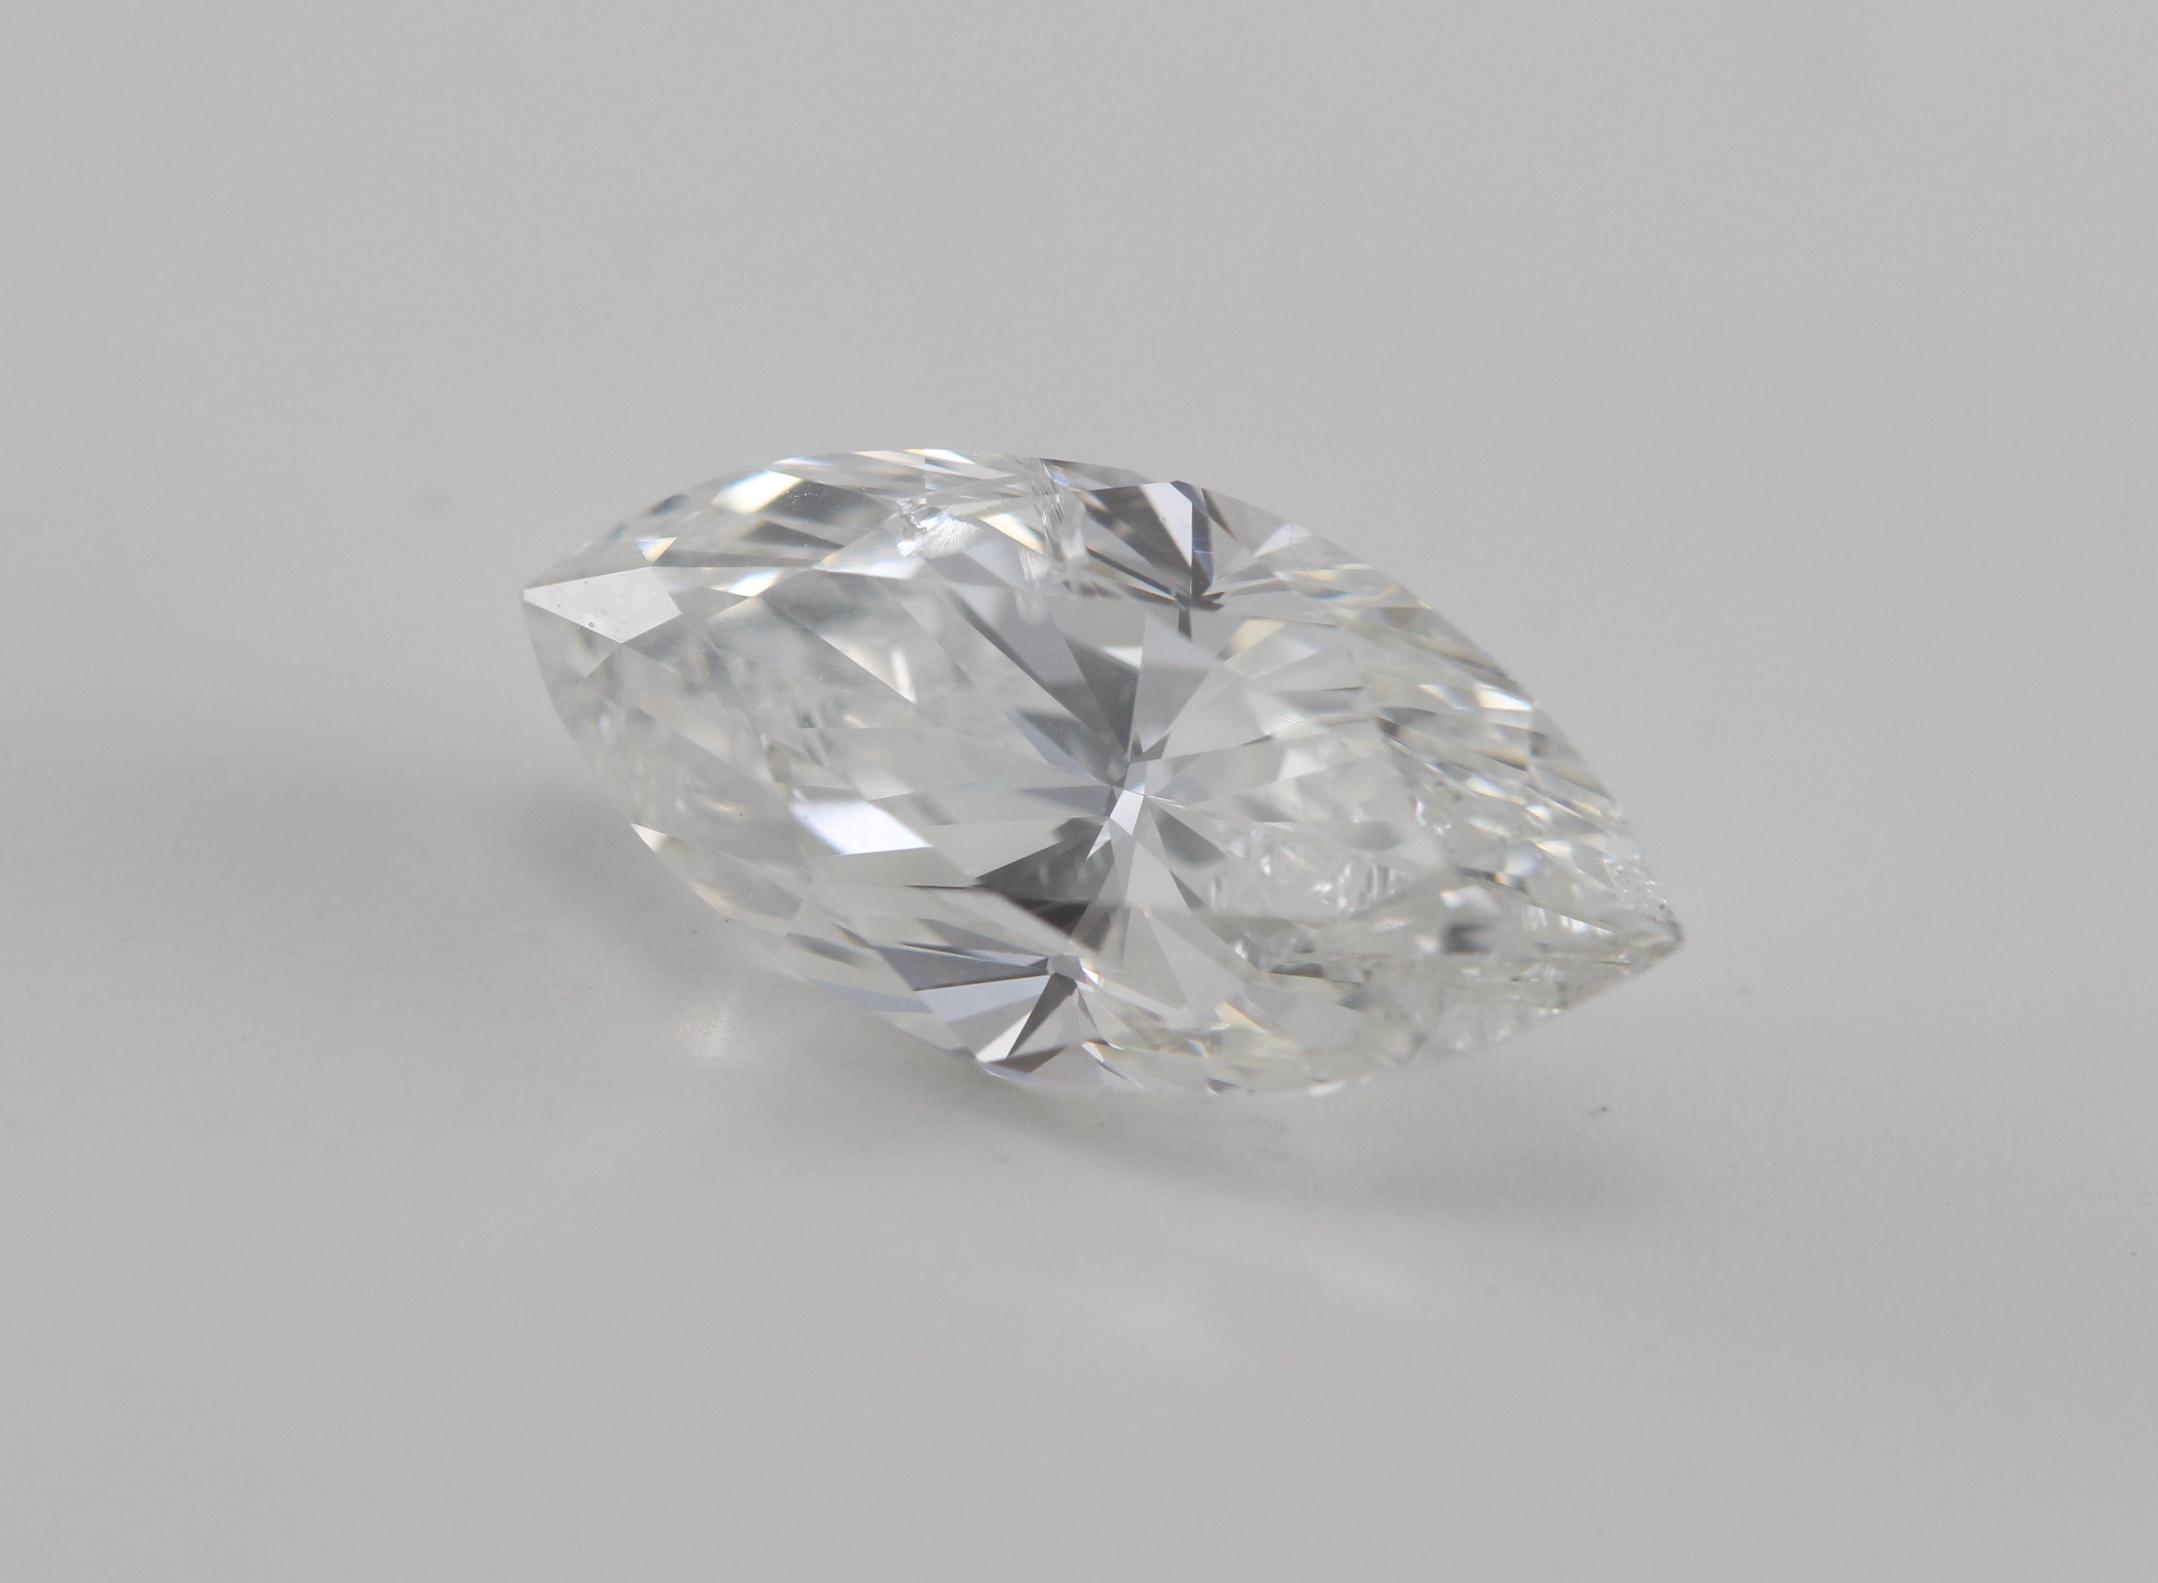 Marquise Cut Loose Diamond 1 03 Ct H I1 Ebay